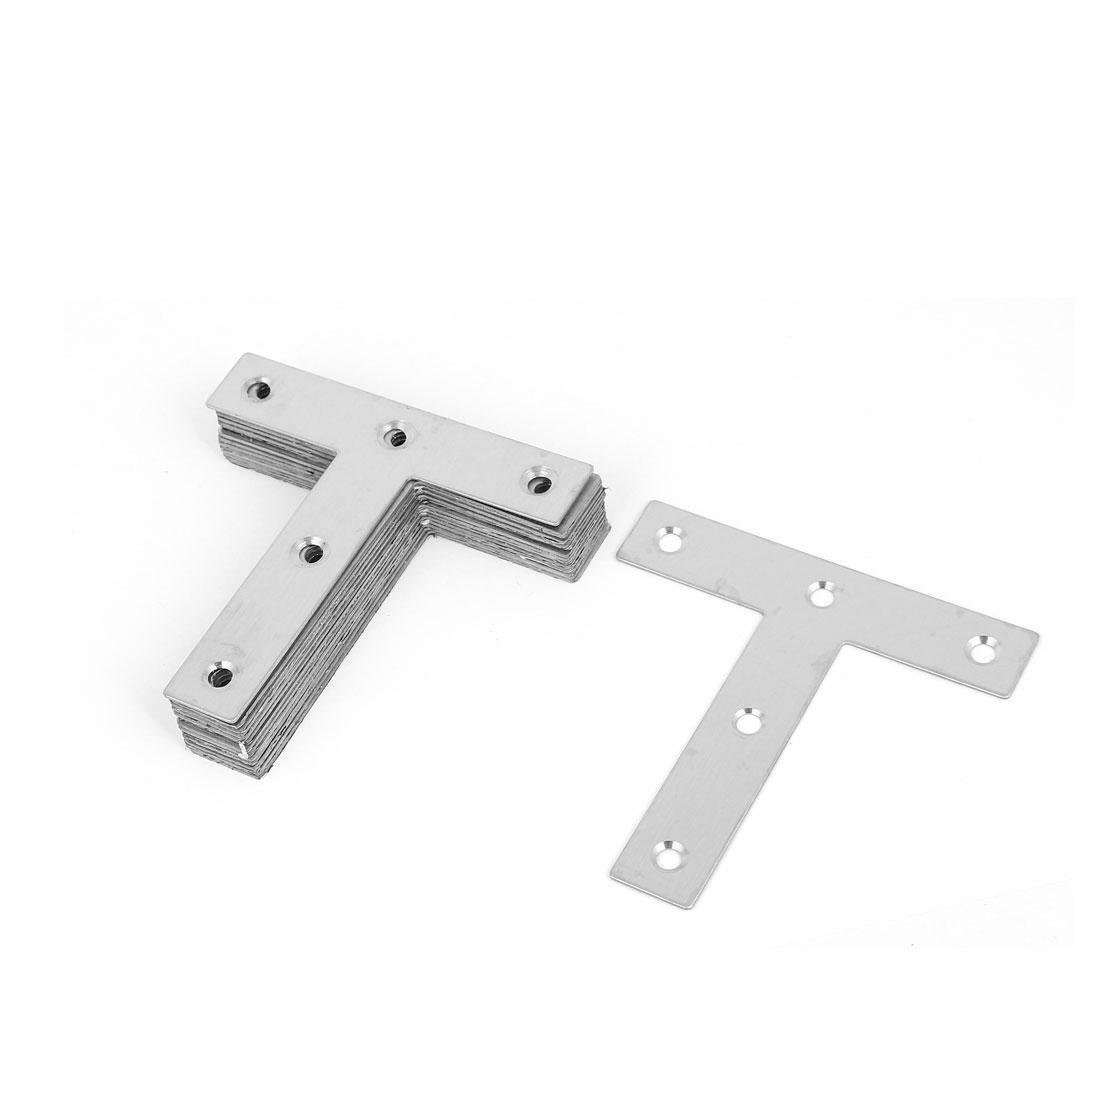 80mmx80mm T Shaped Flat Stainless Steel Angle Bracket Corner Brace Joint 15 Pcs